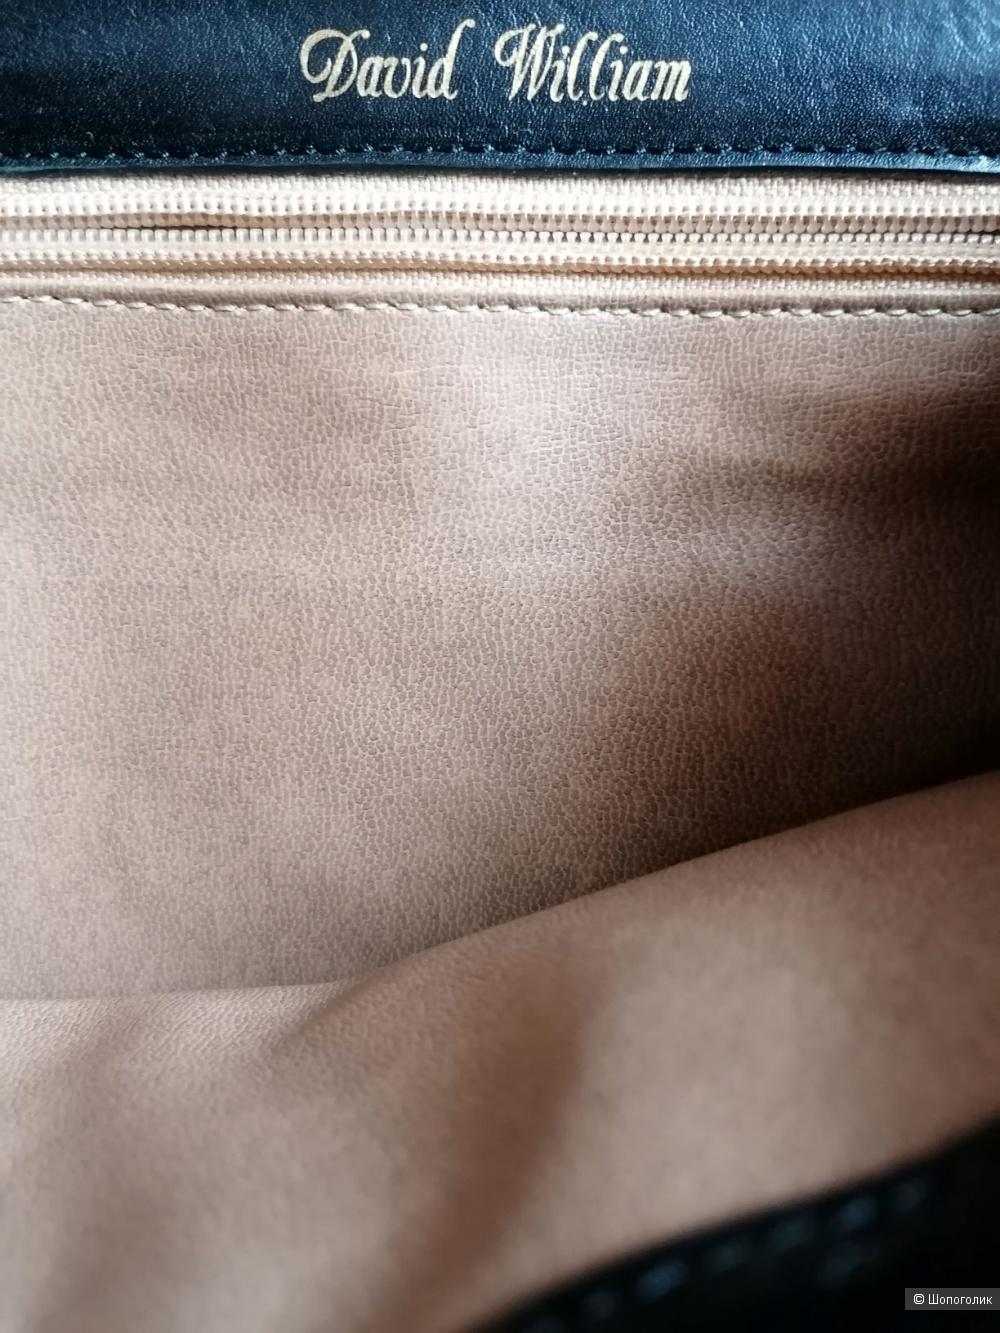 Кожаная сумка David William